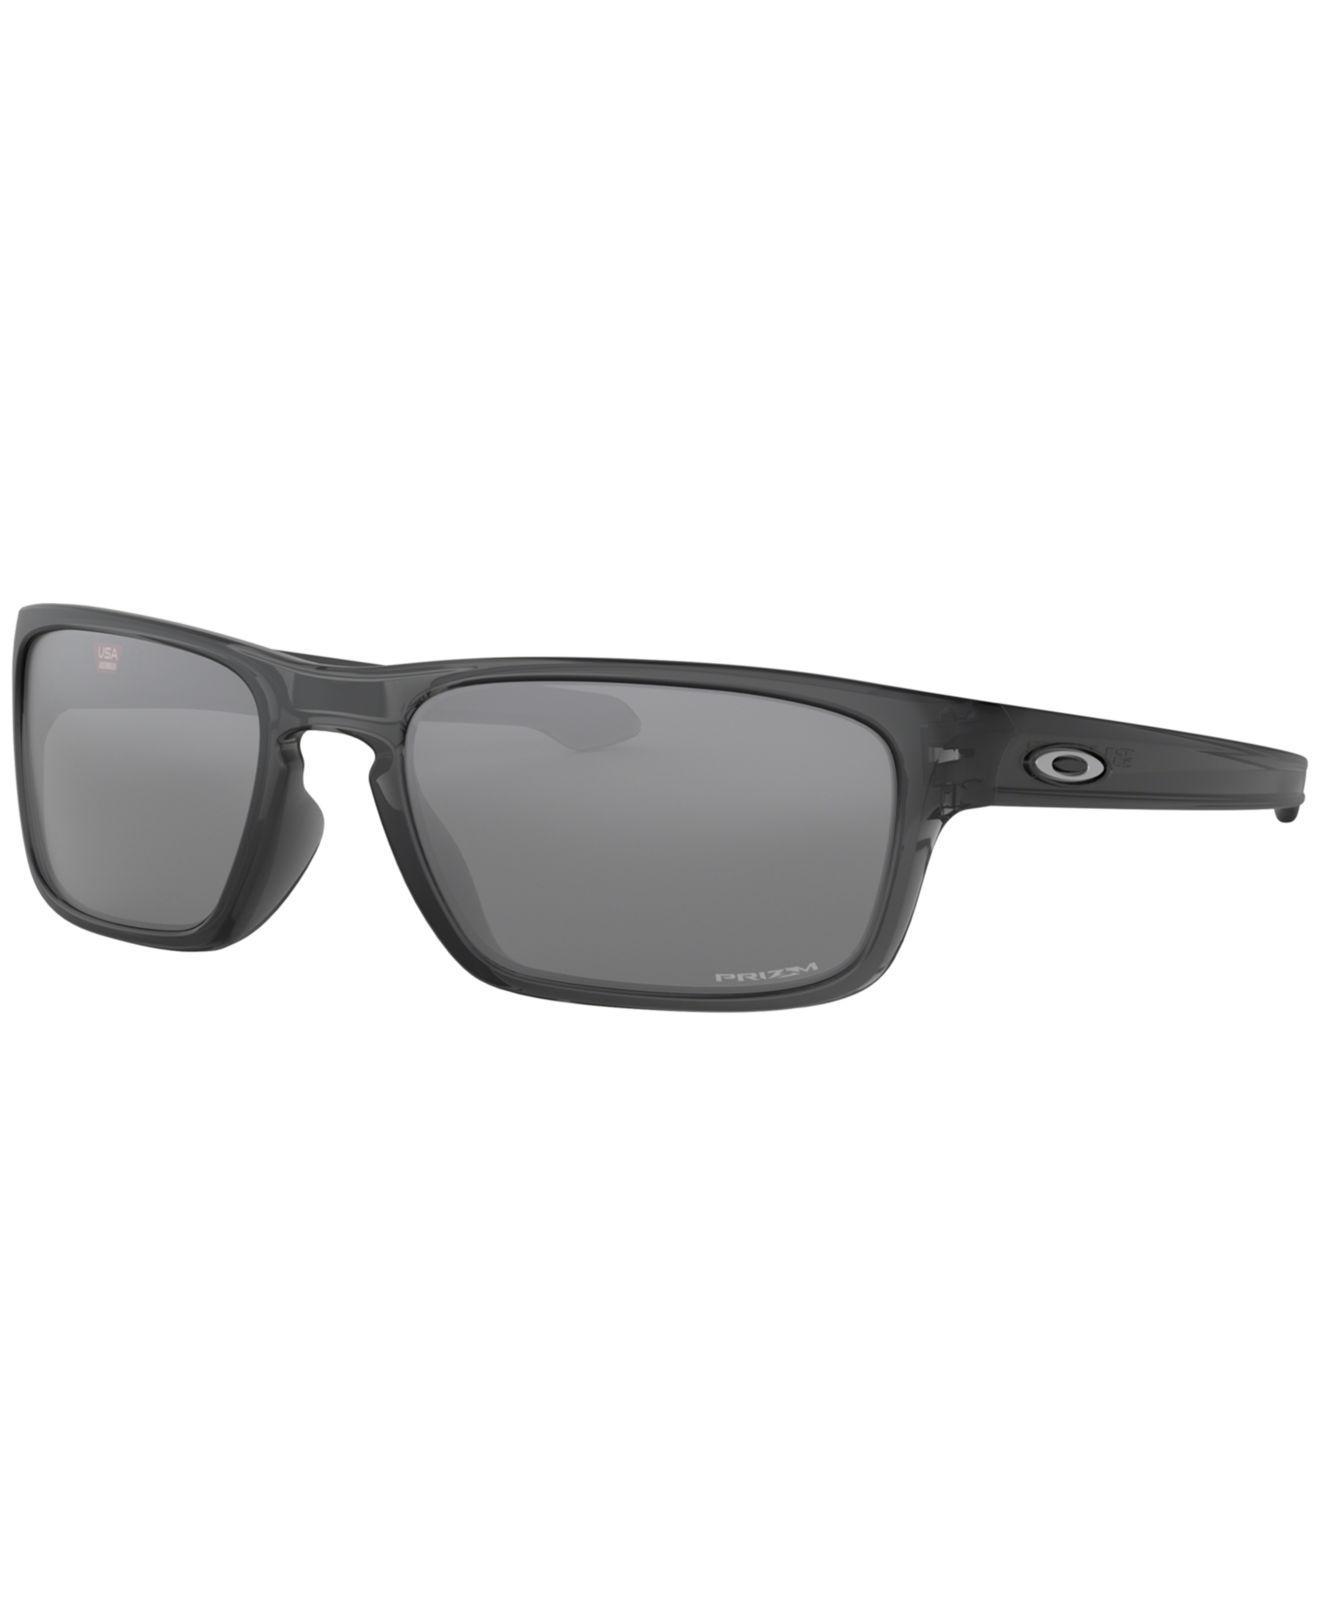 424d1184b0 Oakley. Men s Gray Sliver Steal Sunglasses ...